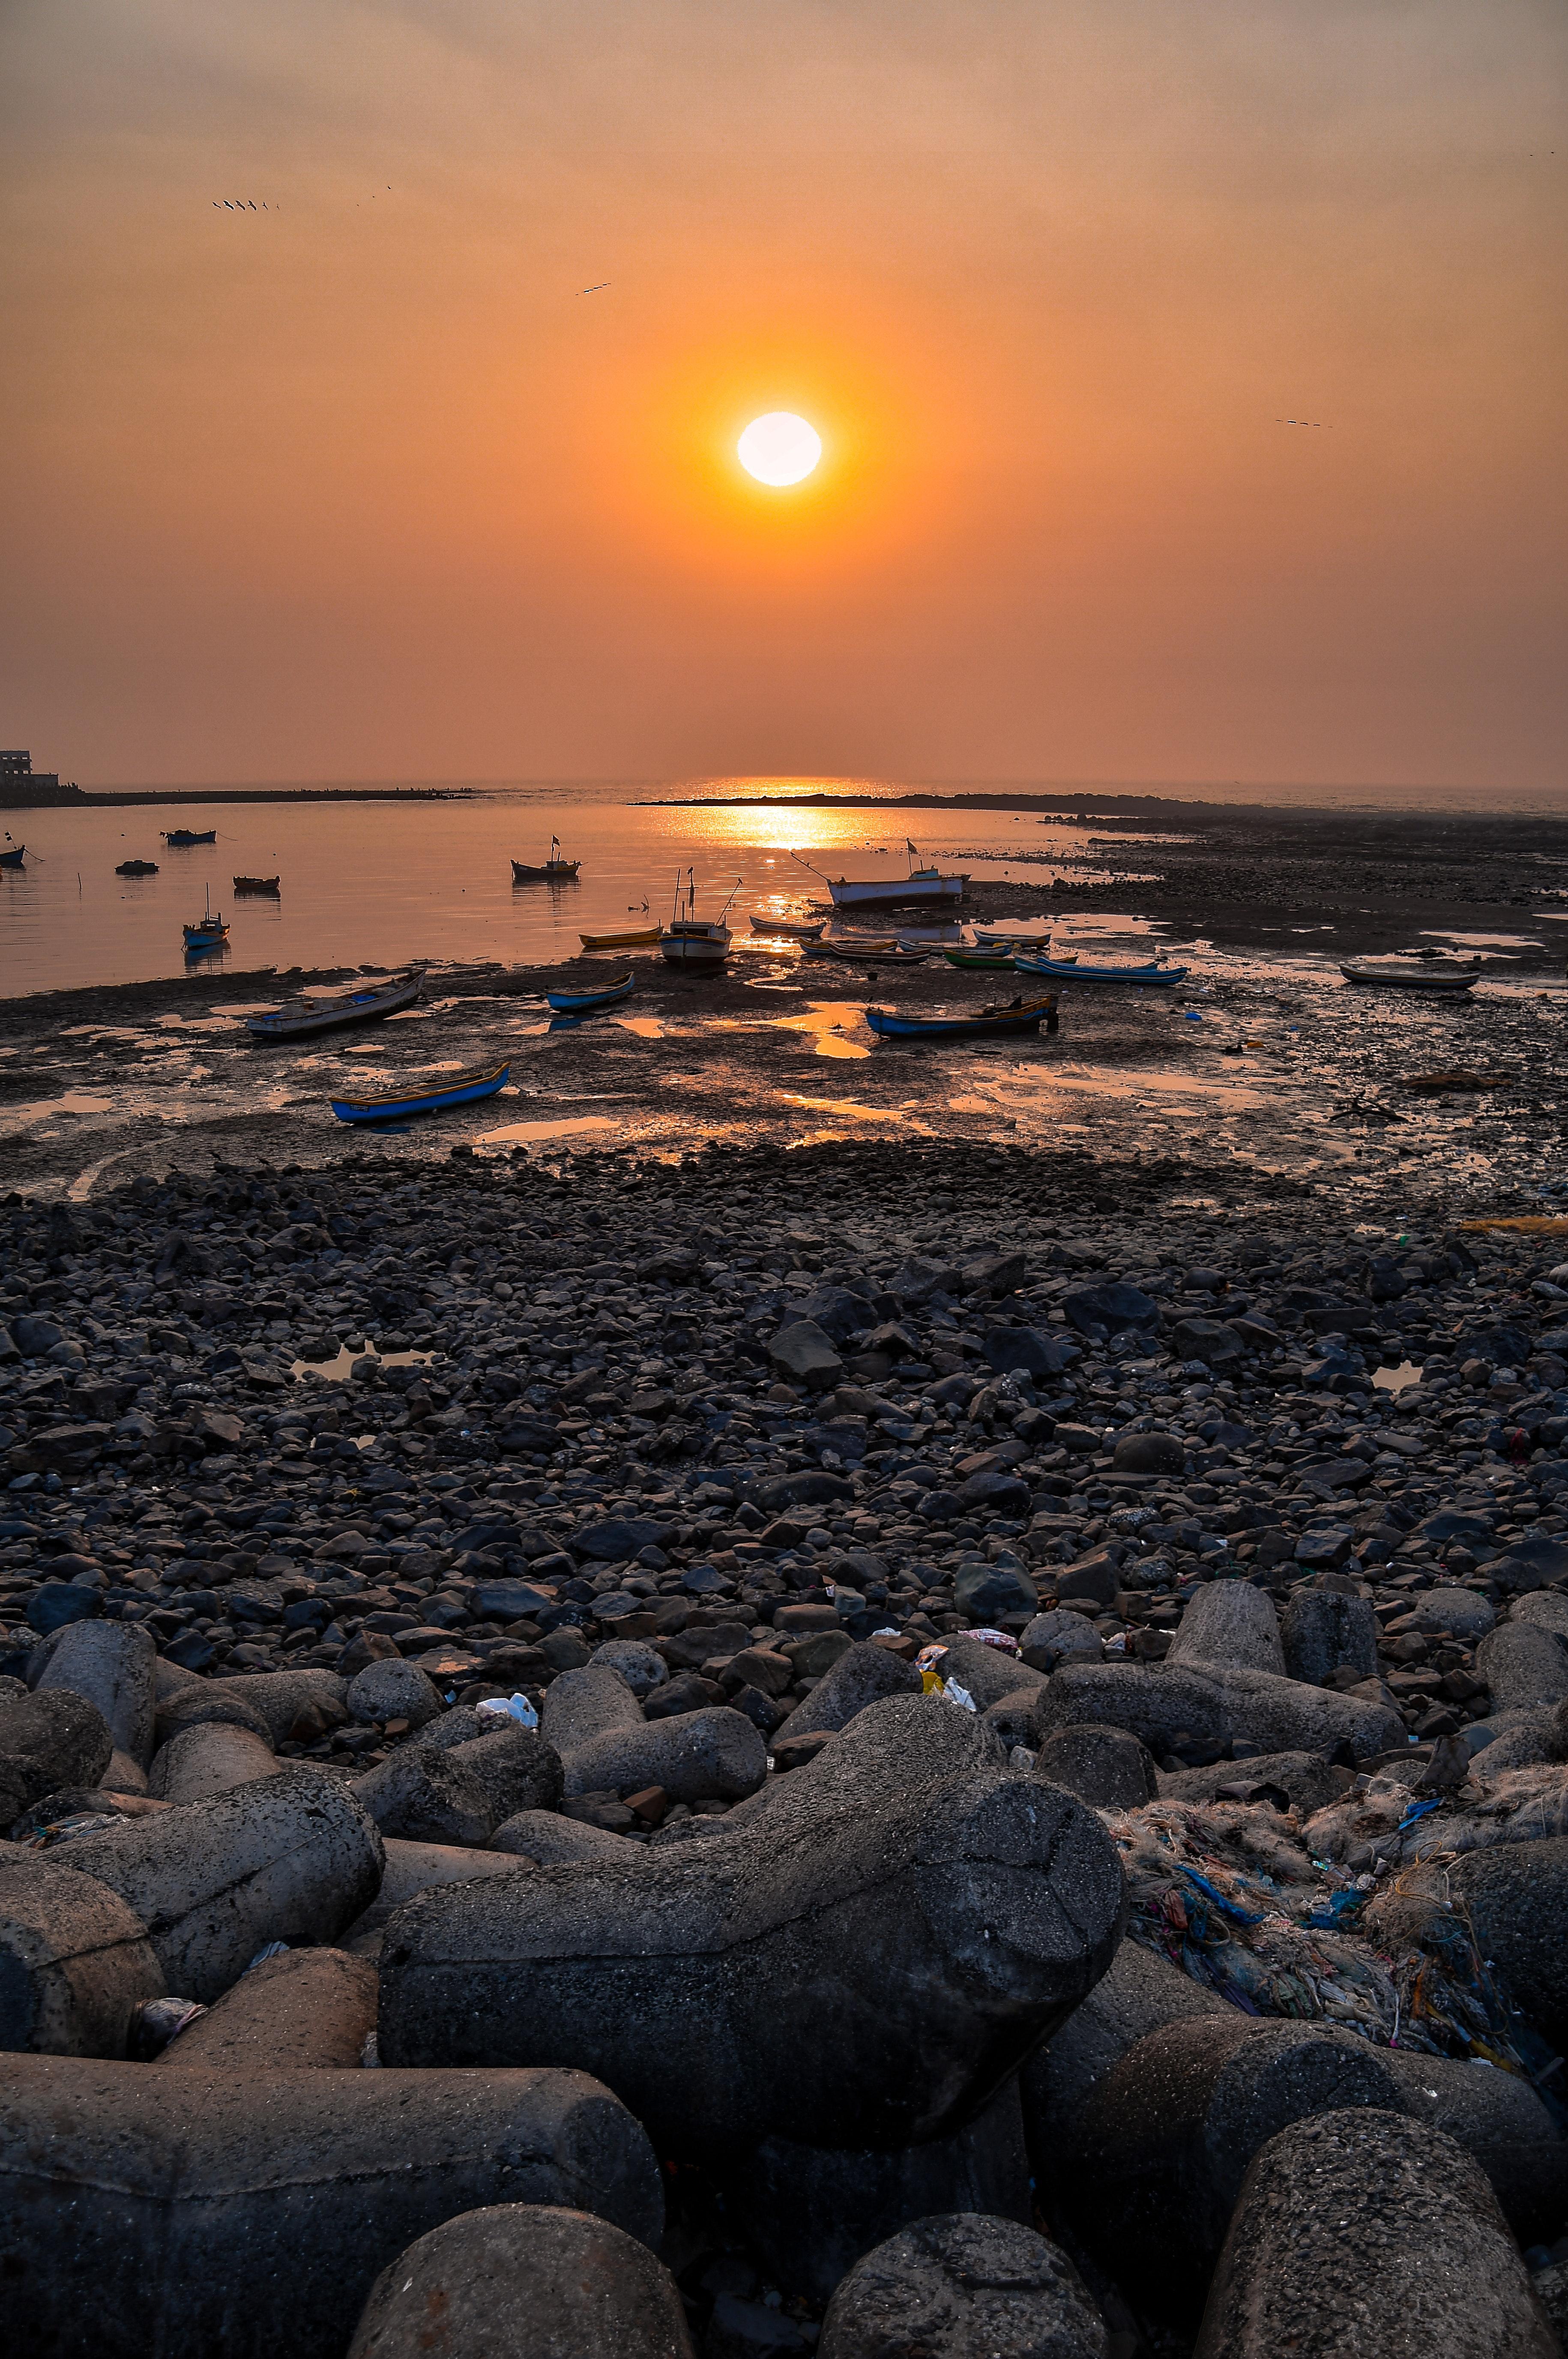 Golden hour photo of seashore